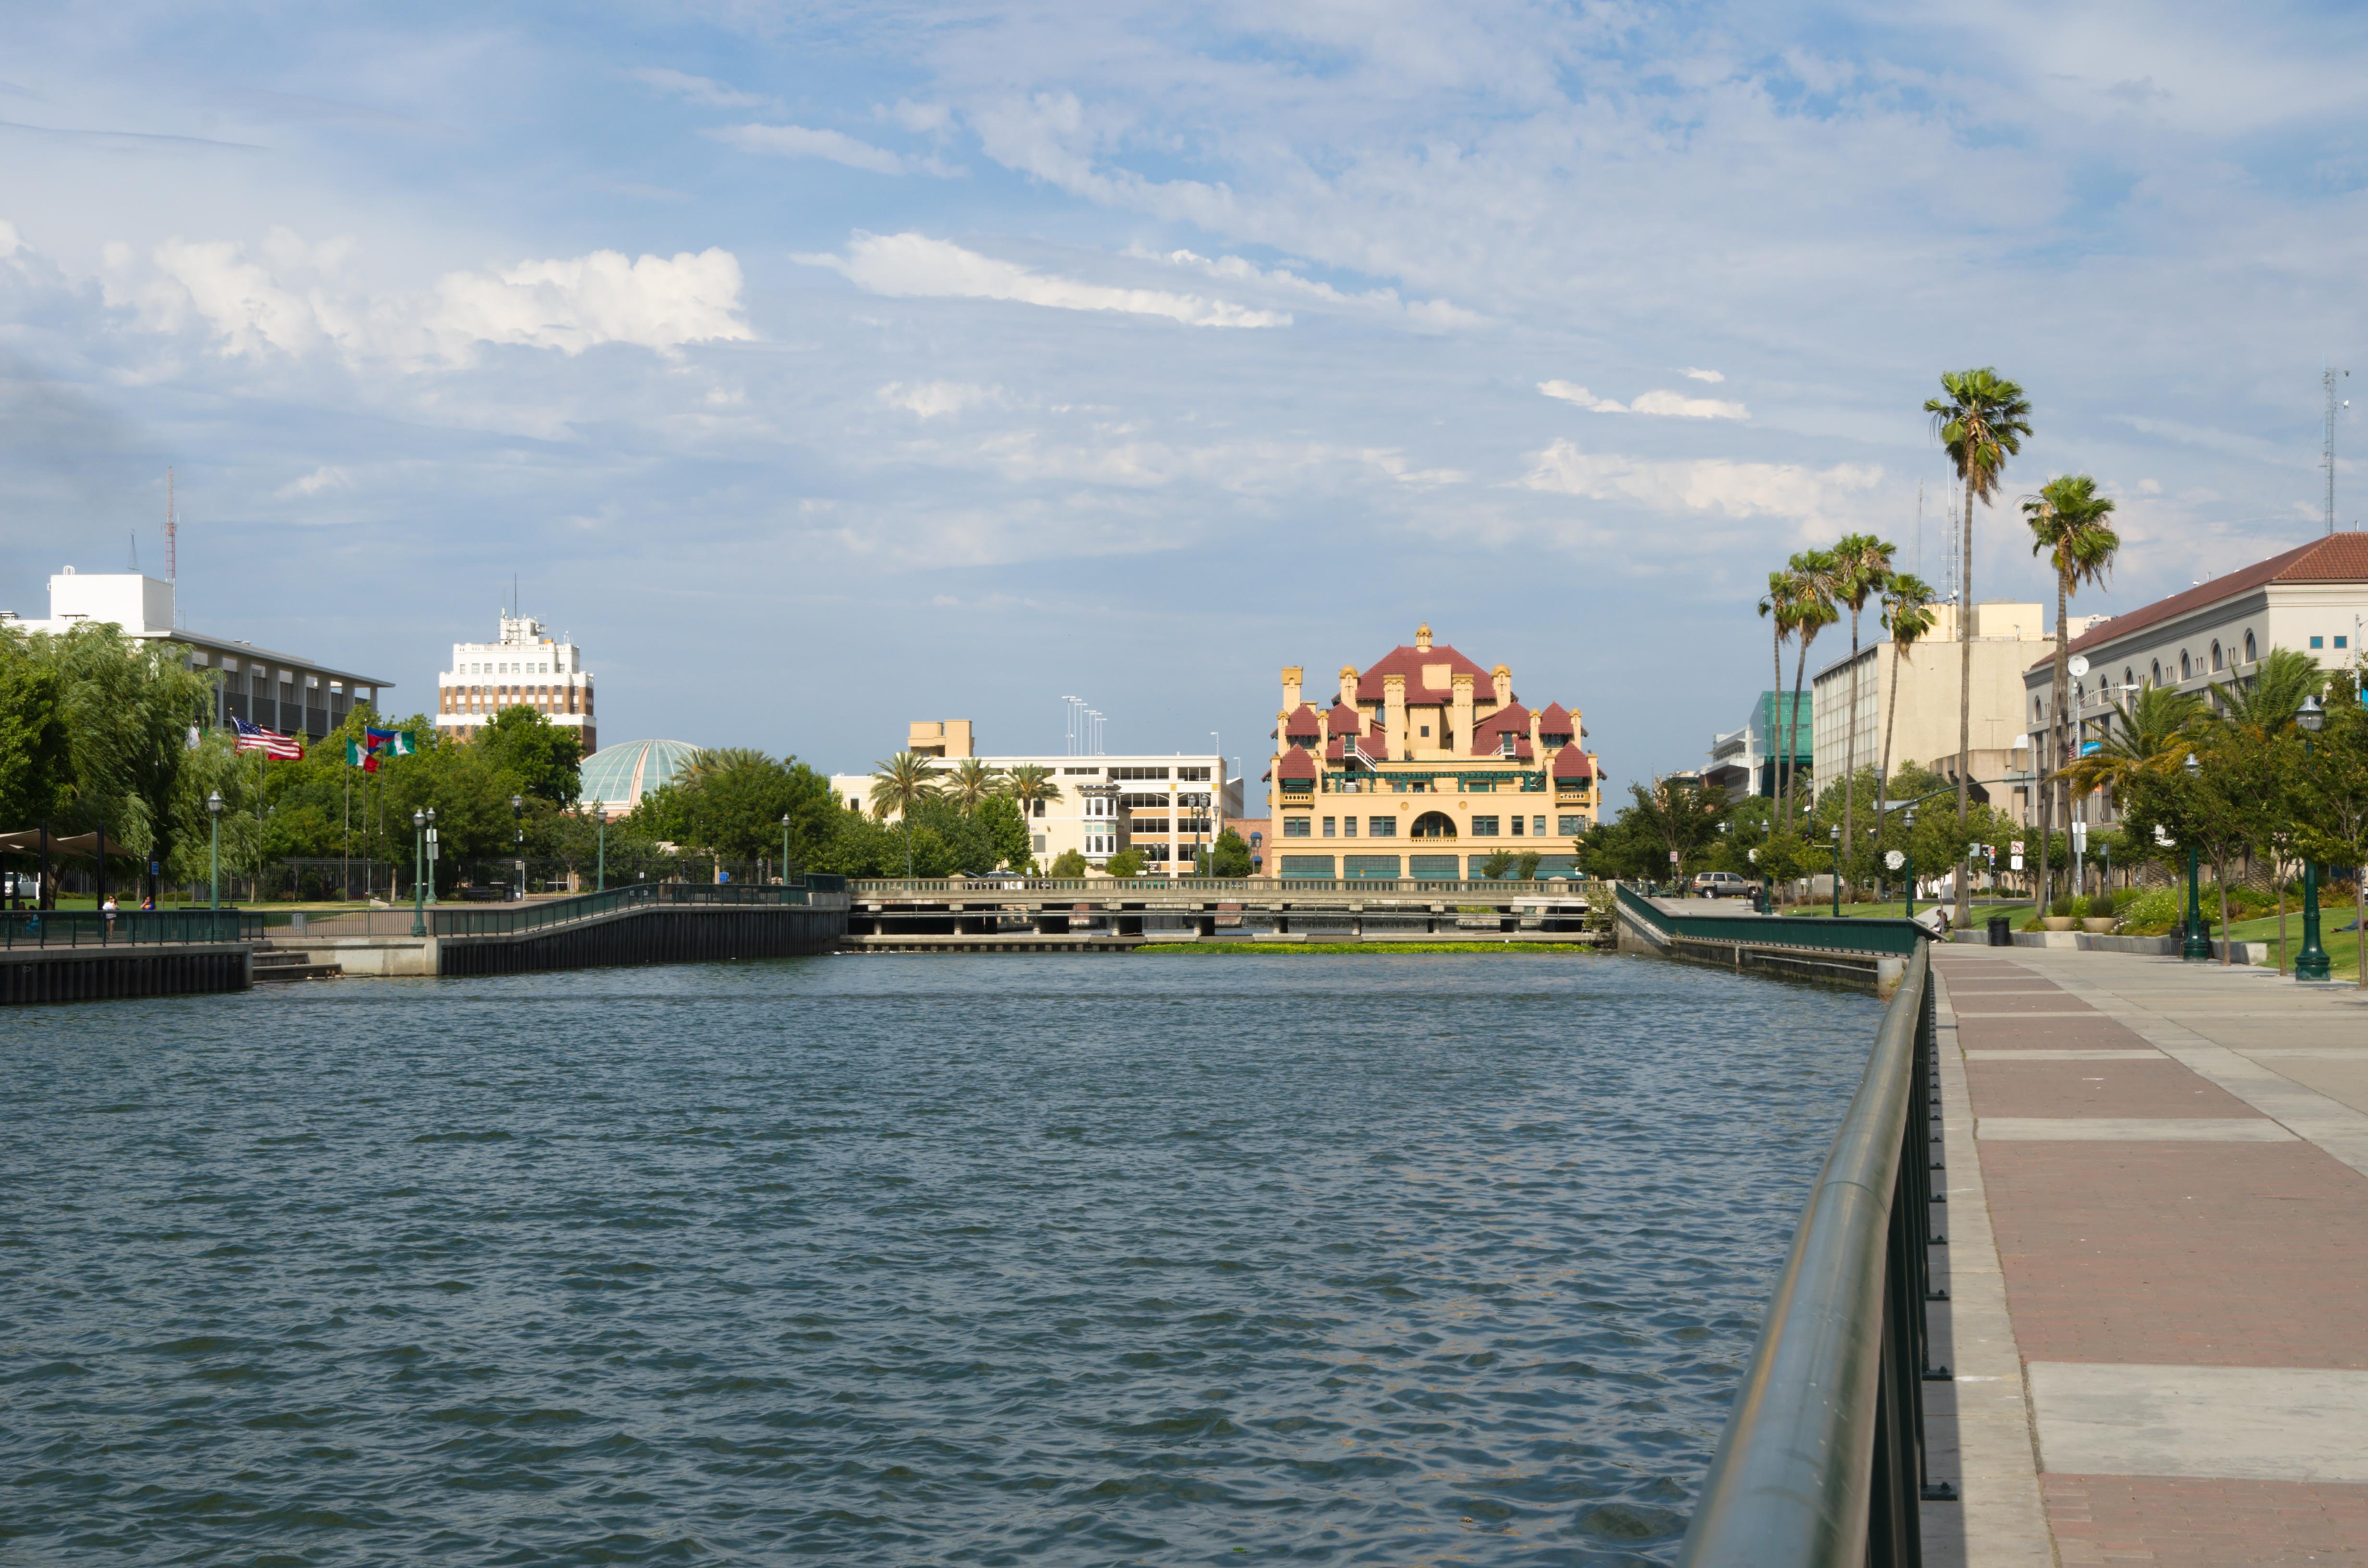 Stockton w Kalifornii (Fot. Wikimedia/LPS.1, lic. Creative Commons)